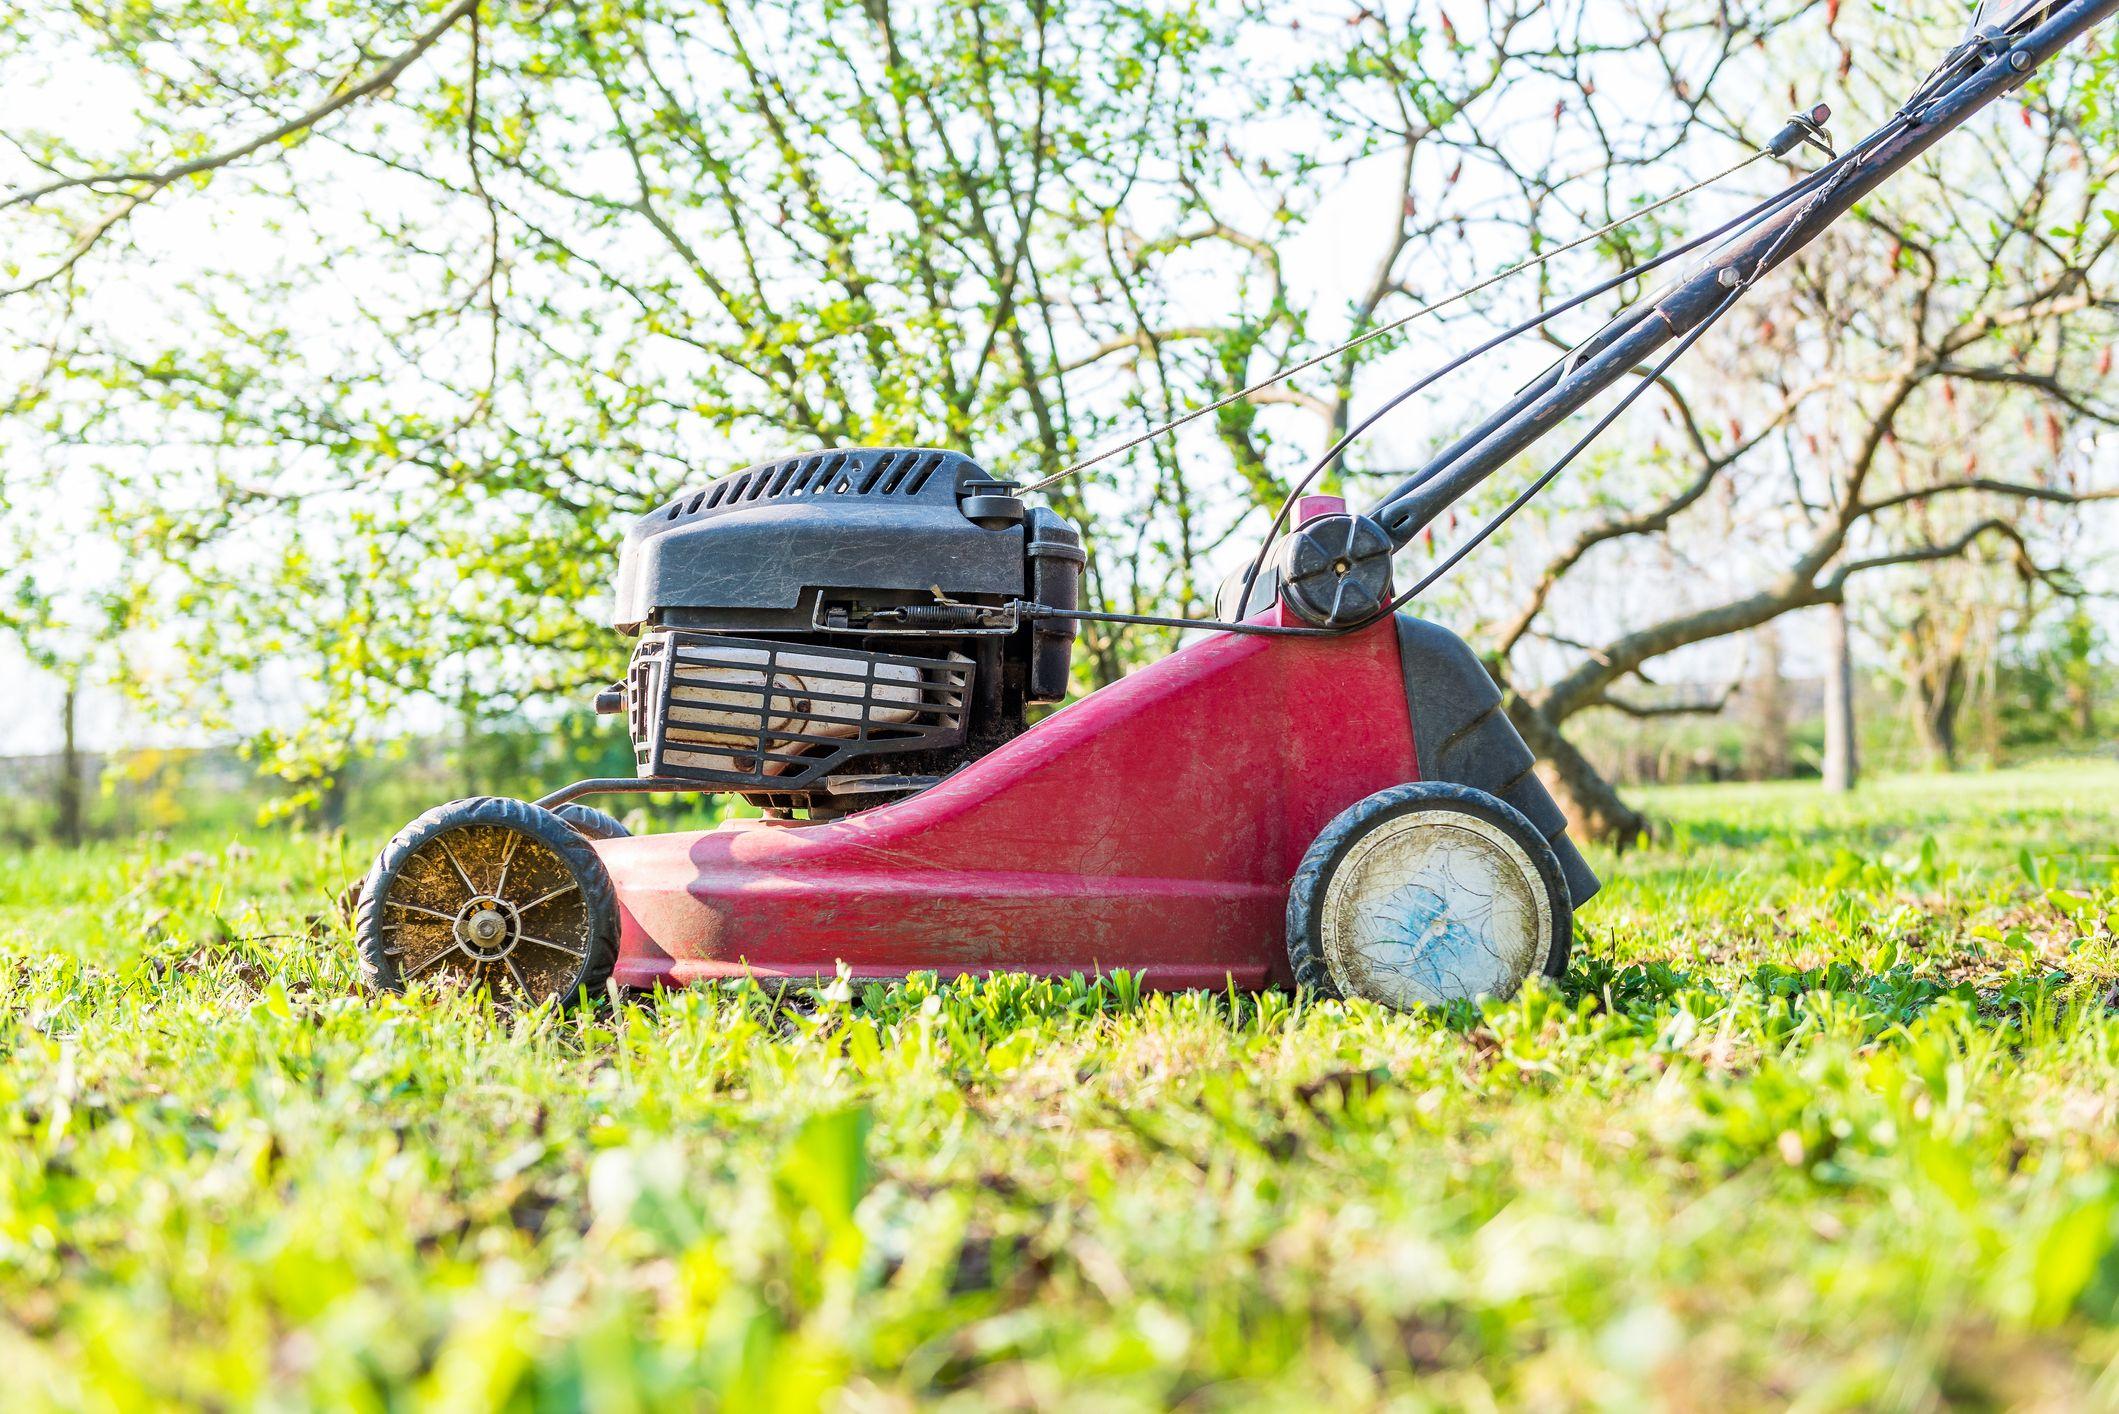 Blades on a Lawn Mower | Blade Sharpening